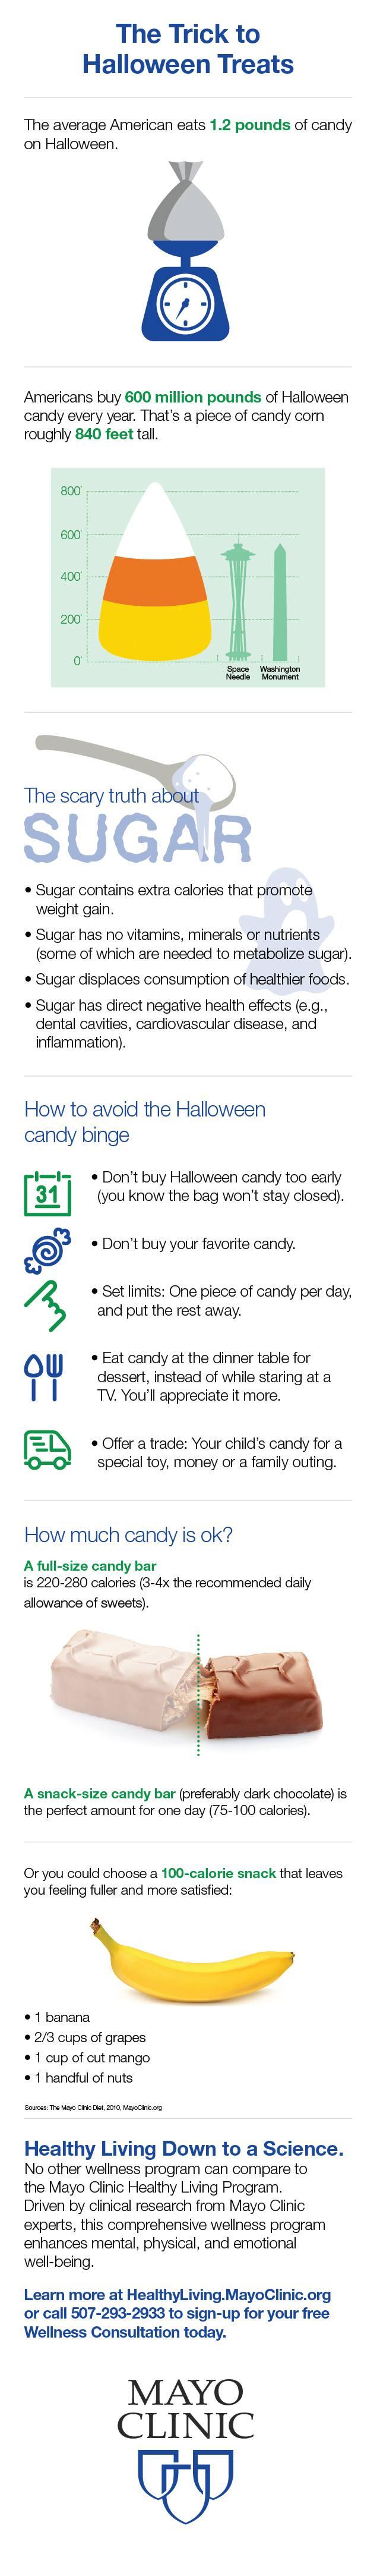 10_20_17_Halloween-Rerun_App_mobile_640wide_infographic.jpg